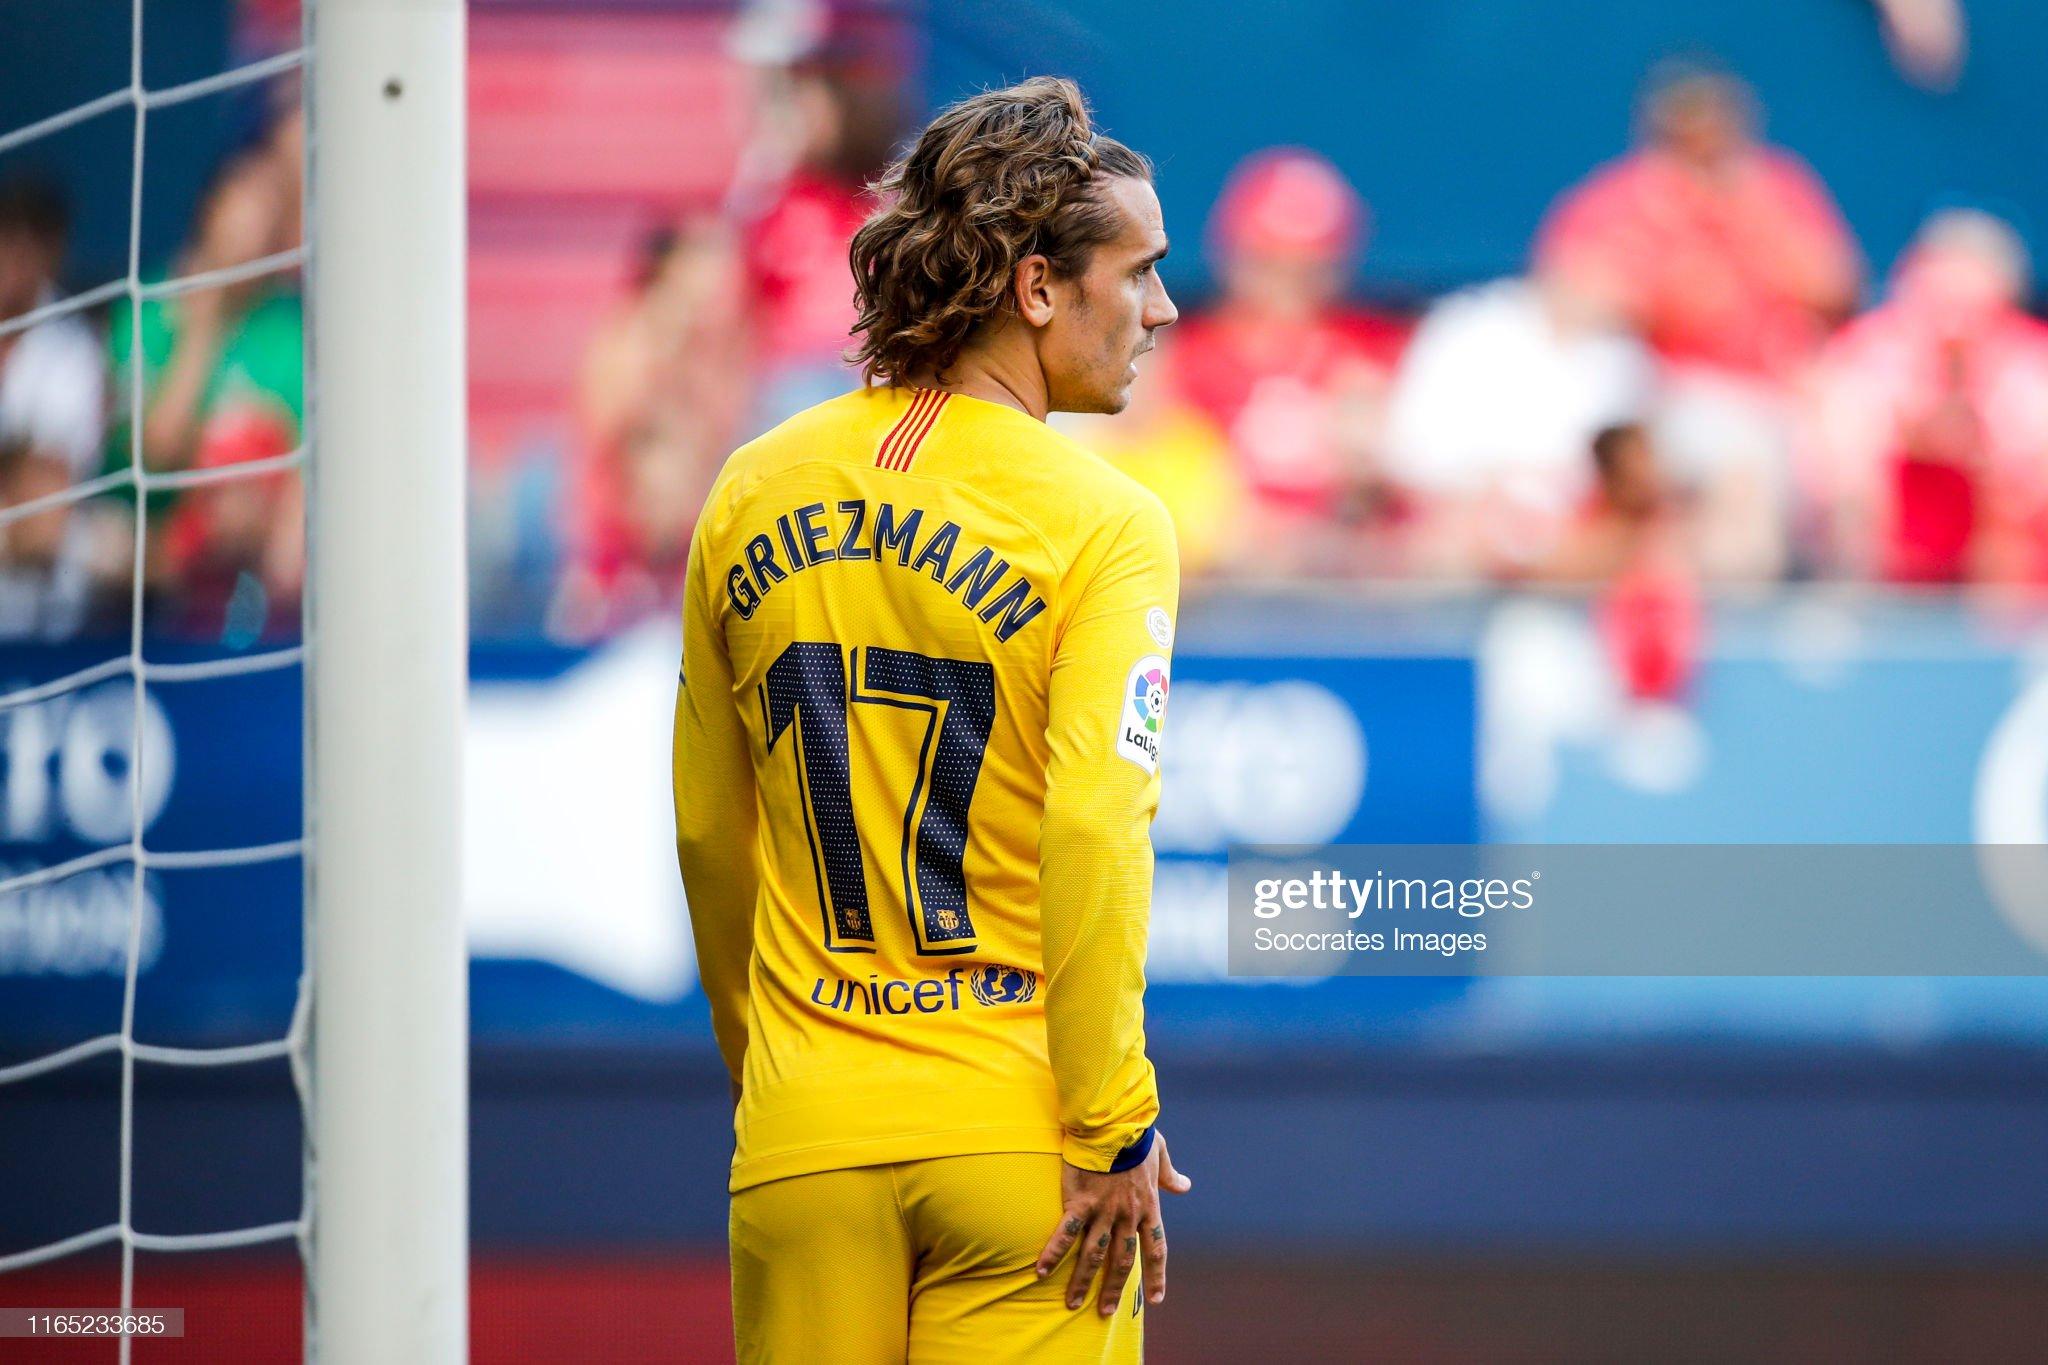 صور مباراة : أوساسونا - برشلونة 2-2 ( 31-08-2019 )  Antoine-griezmann-of-fc-barcelona-during-the-la-liga-santander-match-picture-id1165233685?s=2048x2048